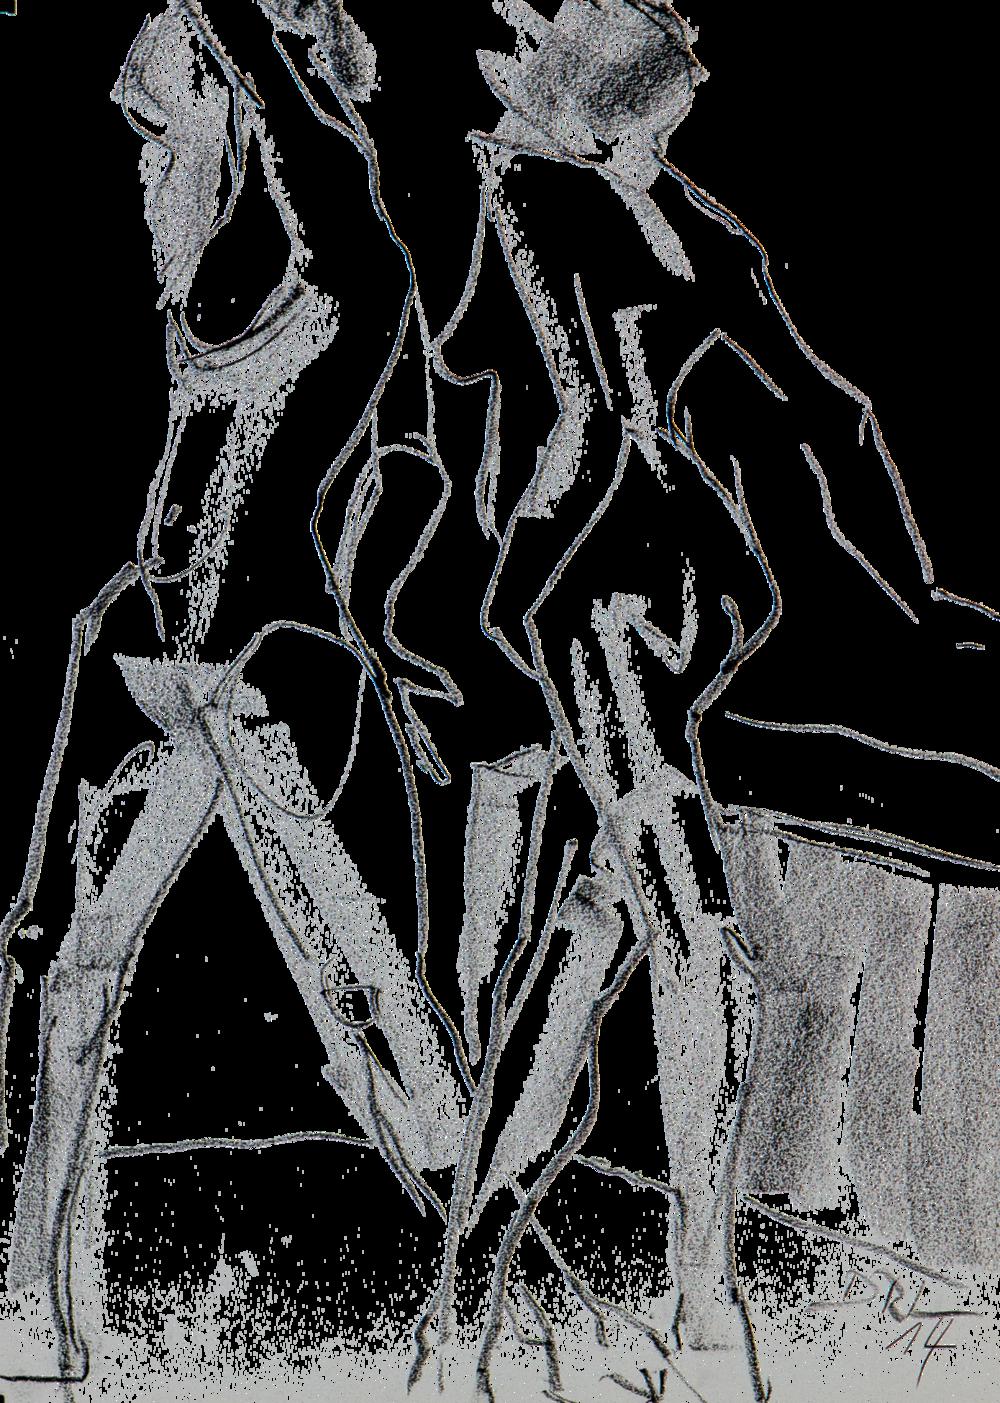 DRL-AktSkizzen-Katalog2016-8329.png